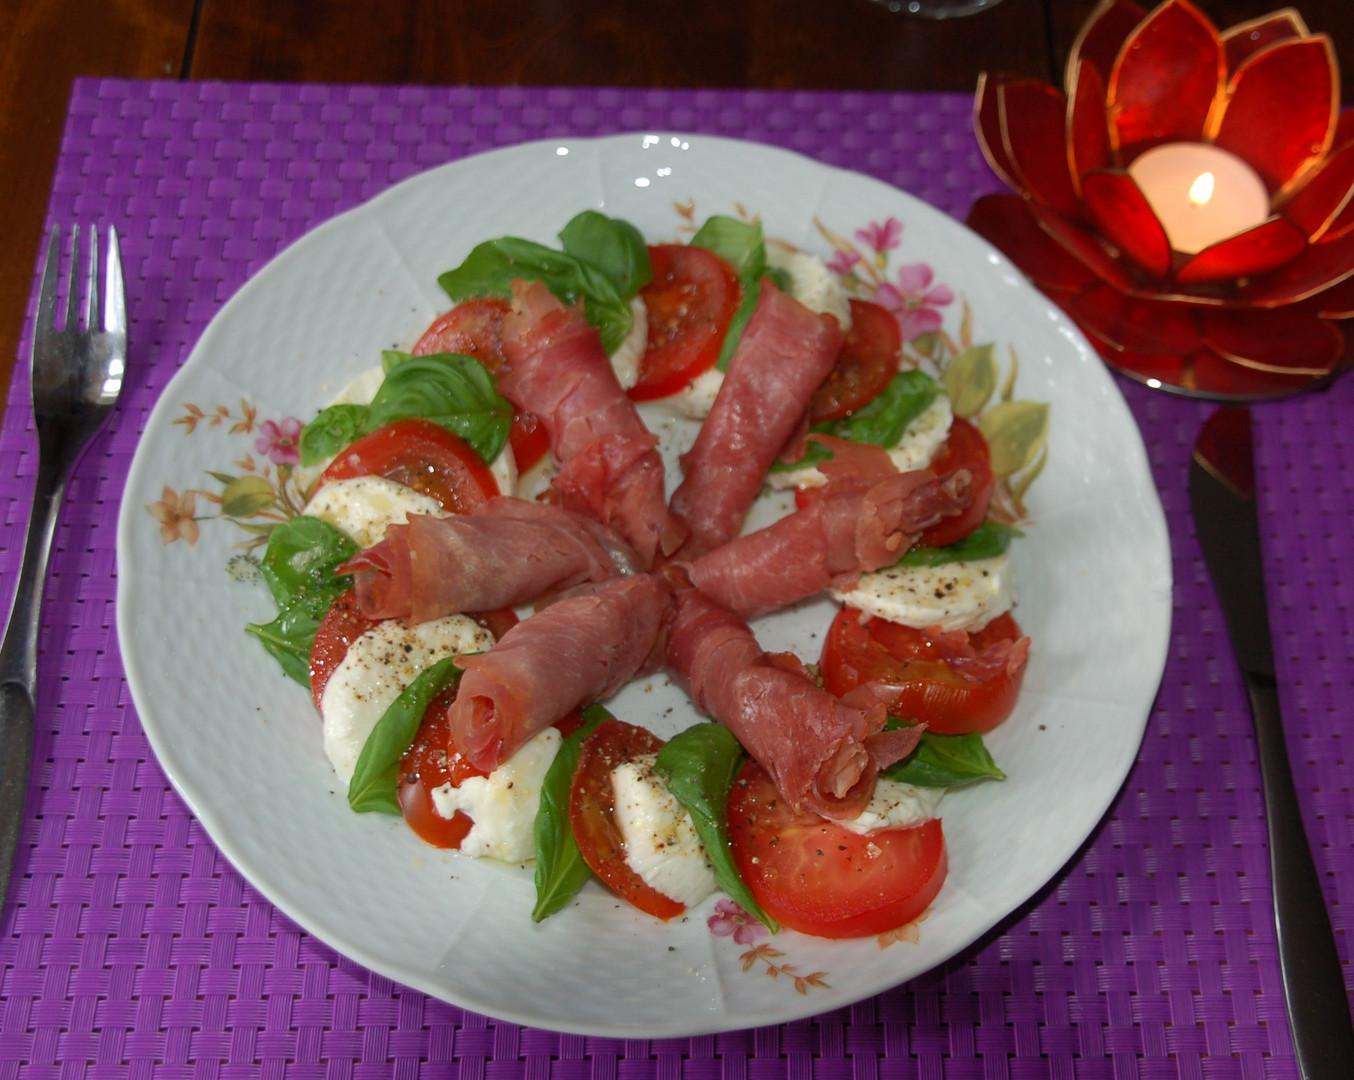 Selfmade tomatoe-, mozarella-. basilic- and hamsalad